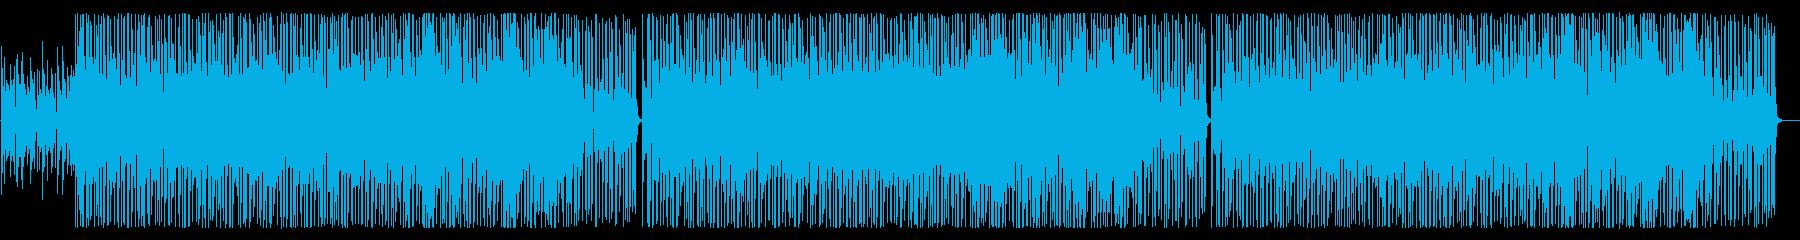 YouTube アコギ・ファンク・軽快の再生済みの波形